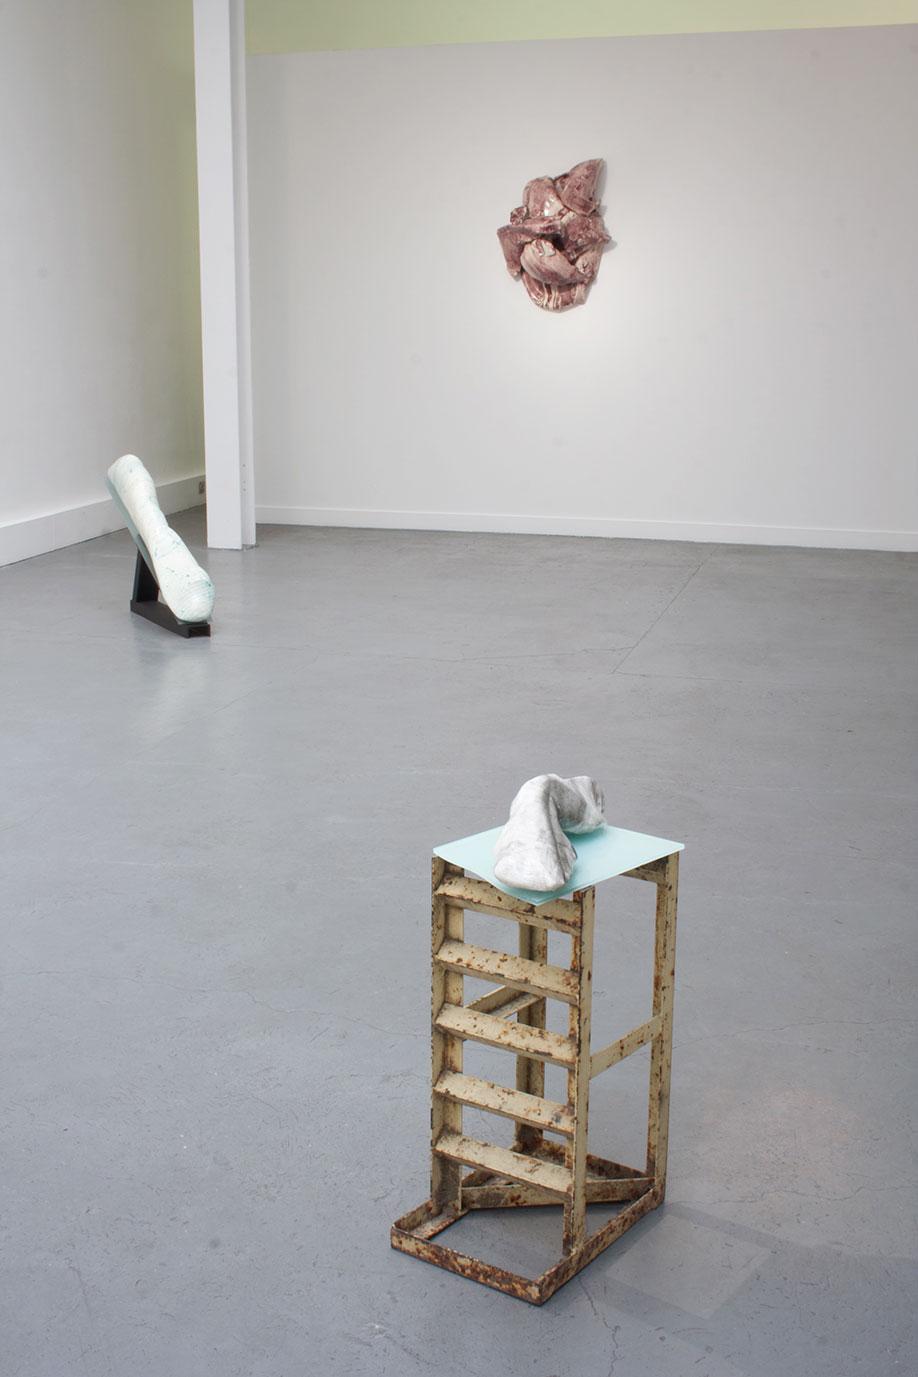 <b>Title:&nbsp;</b>La Galerie Particuliére, Paris, installation view<br /><b>Year:&nbsp;</b>2015<br />